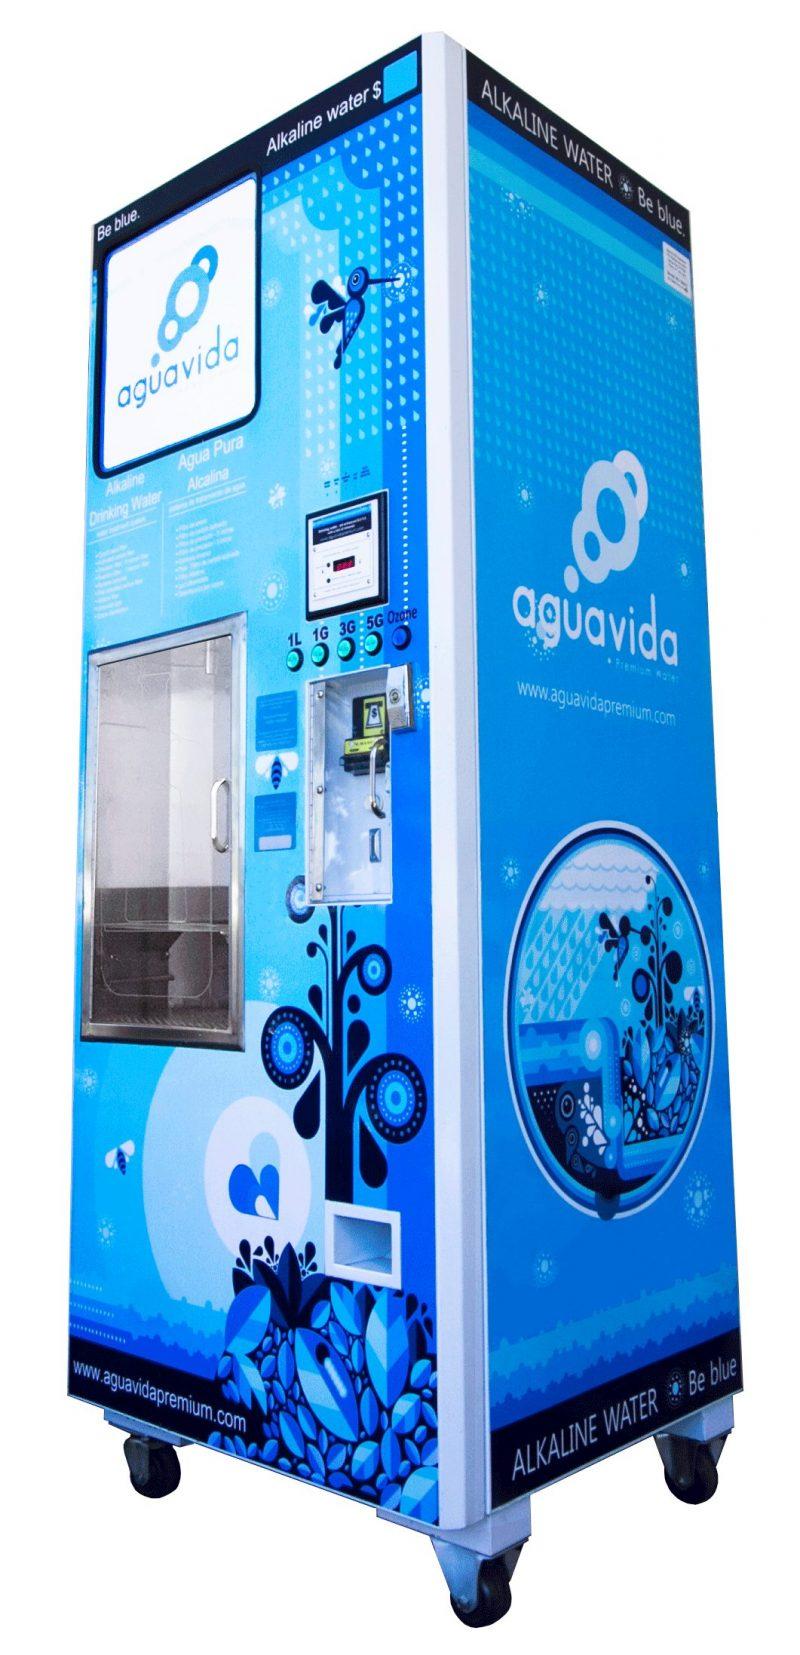 alkaline water vending machine